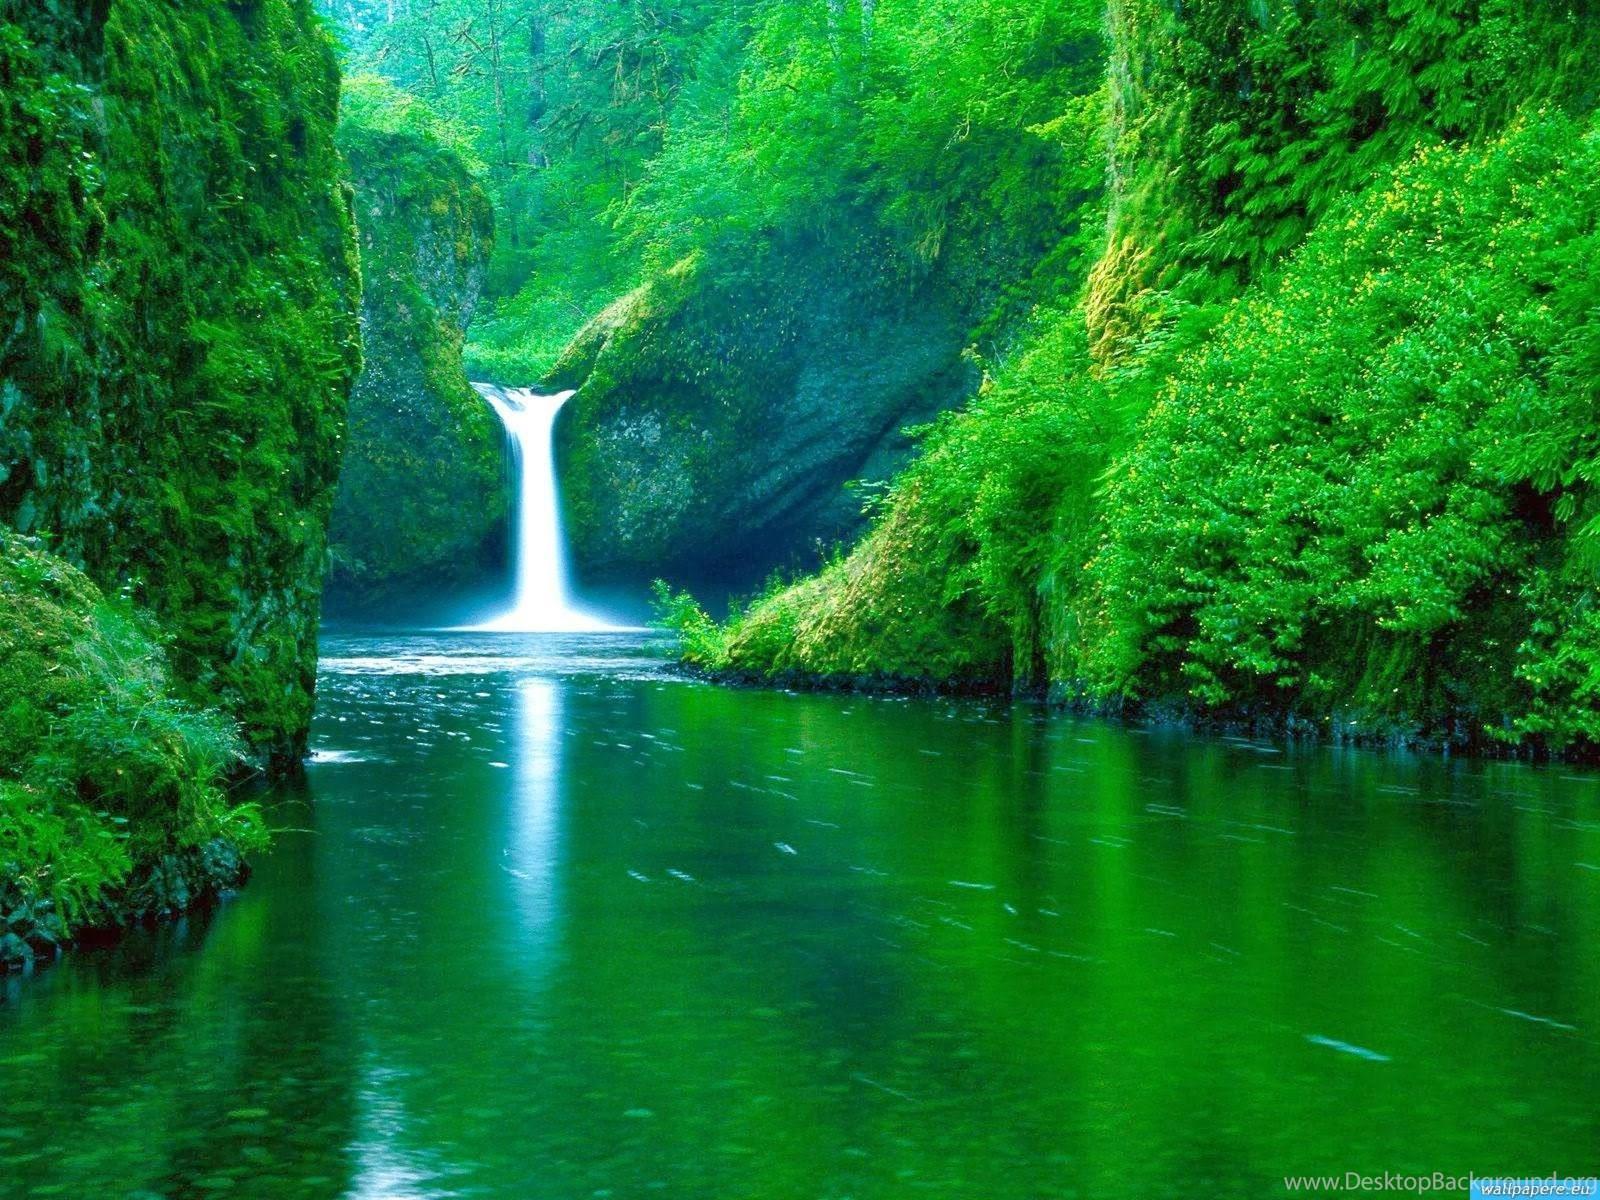 Nature Wallpaper For Desktop Full Size Download   66 Group 1600x1200